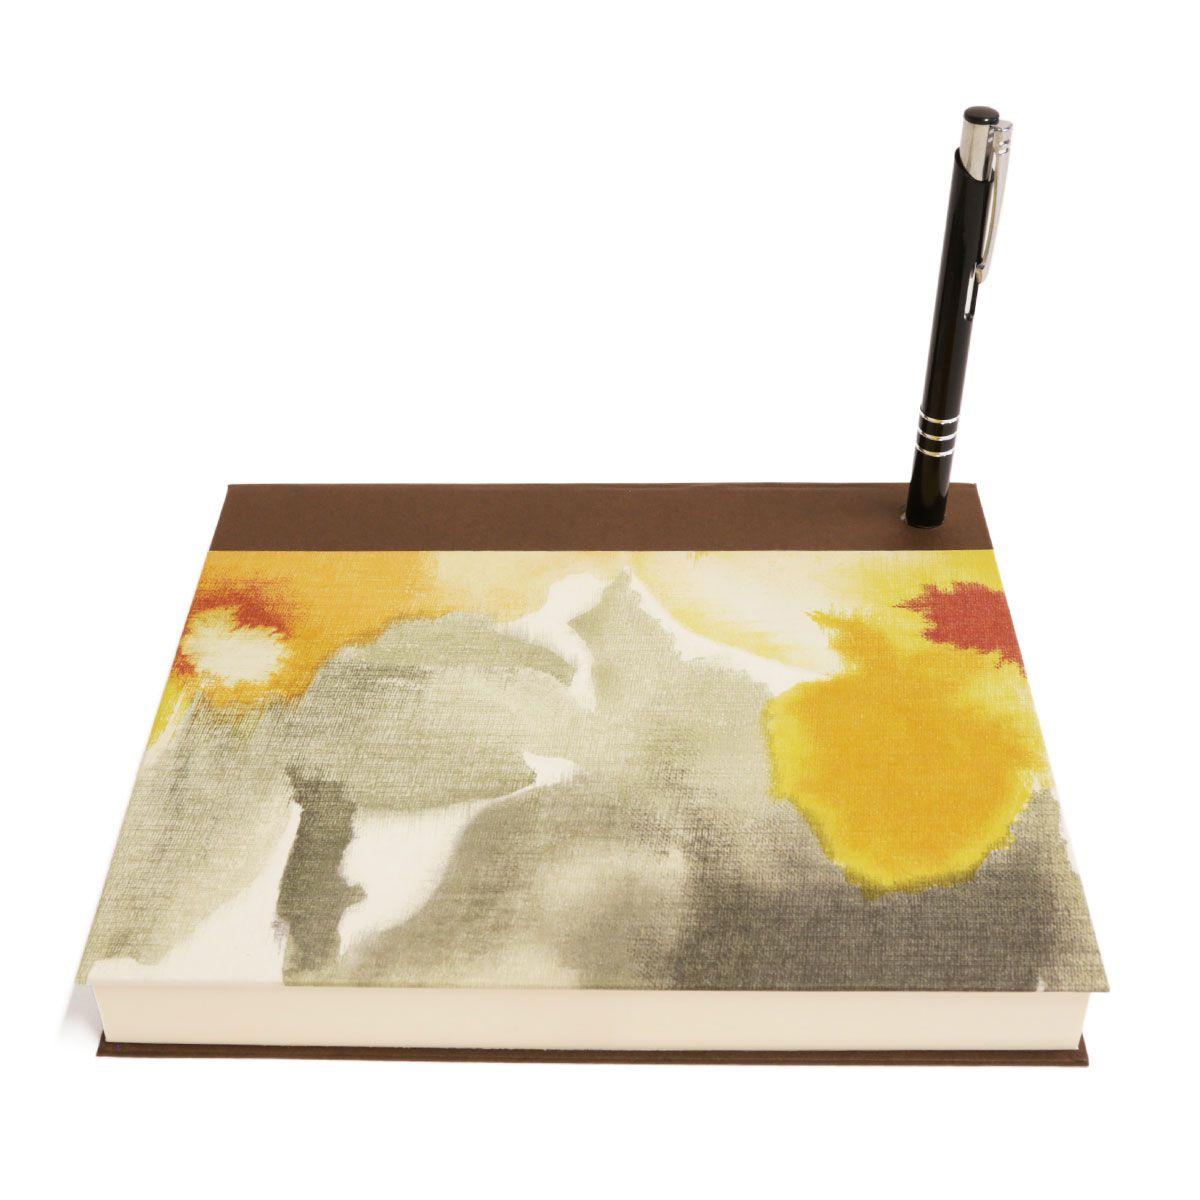 Bloco de desenho (Florear Amarelo)